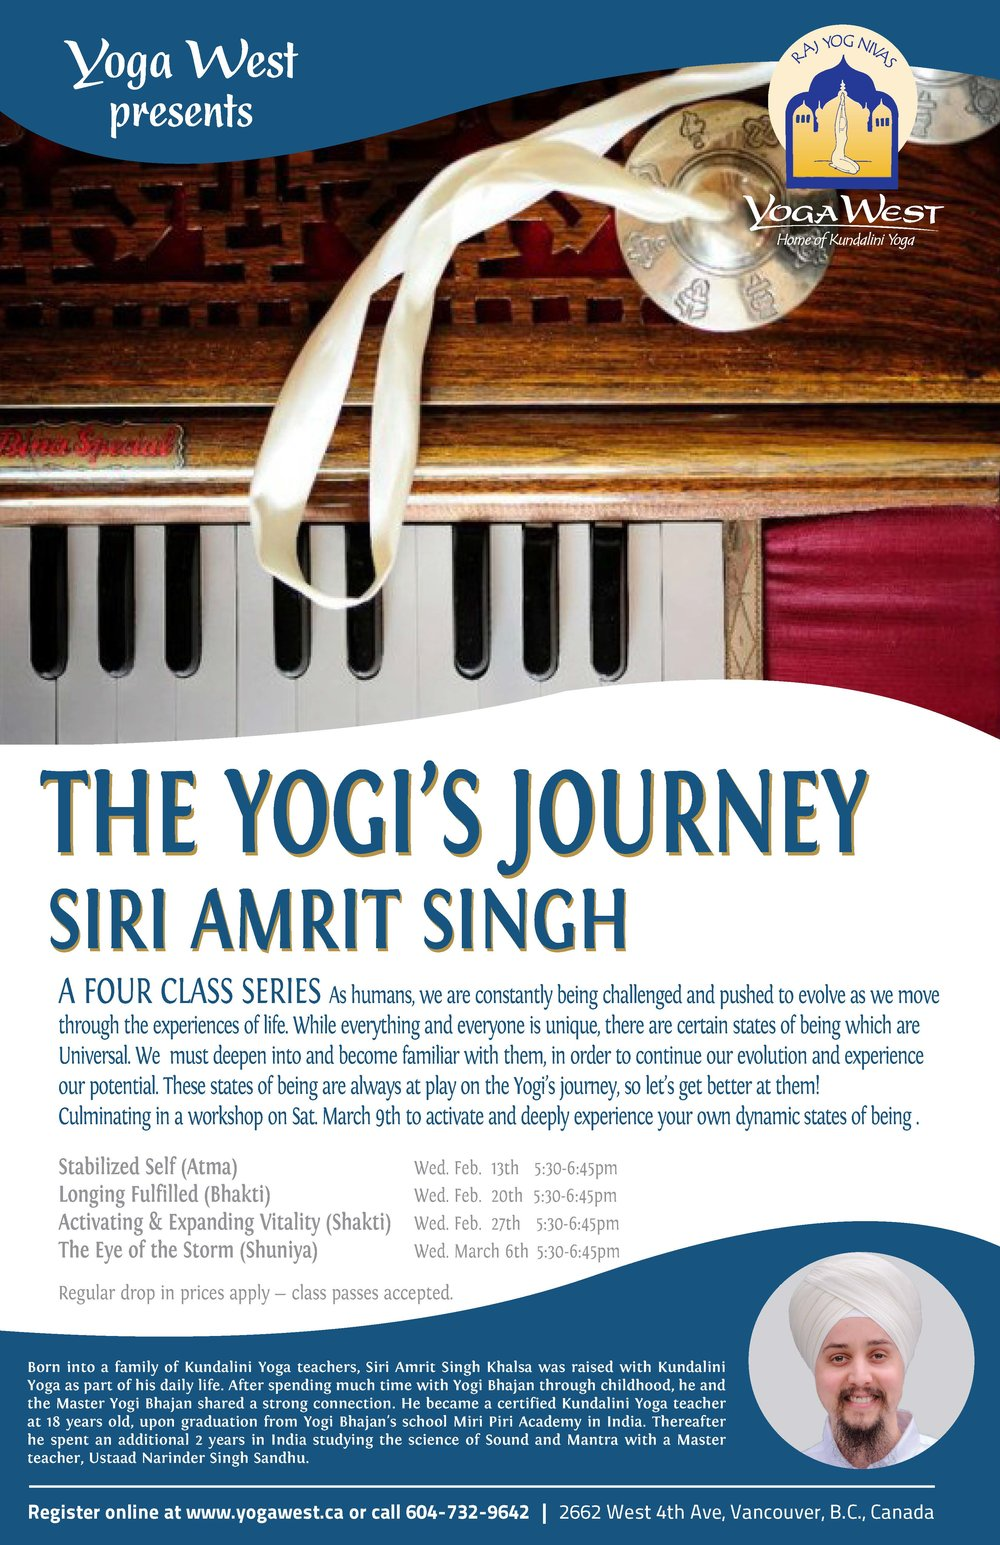 Siri Amrit_Yogi's Journey series.jpg